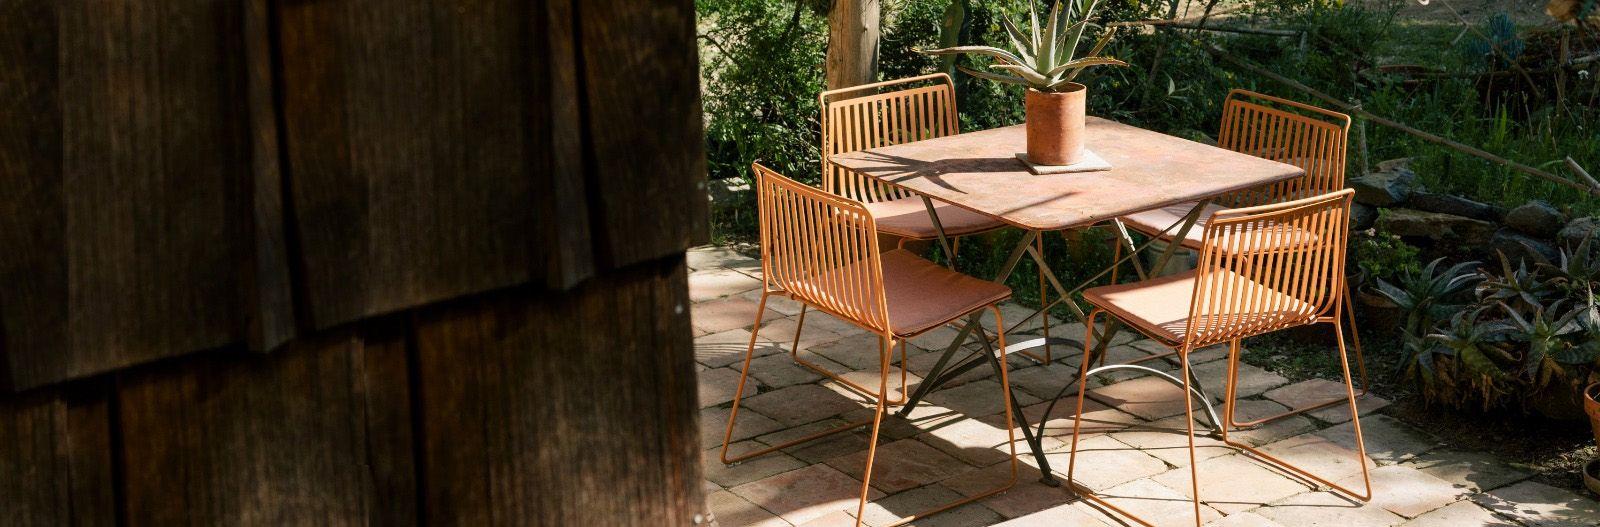 Muebles exterior Ondarreta